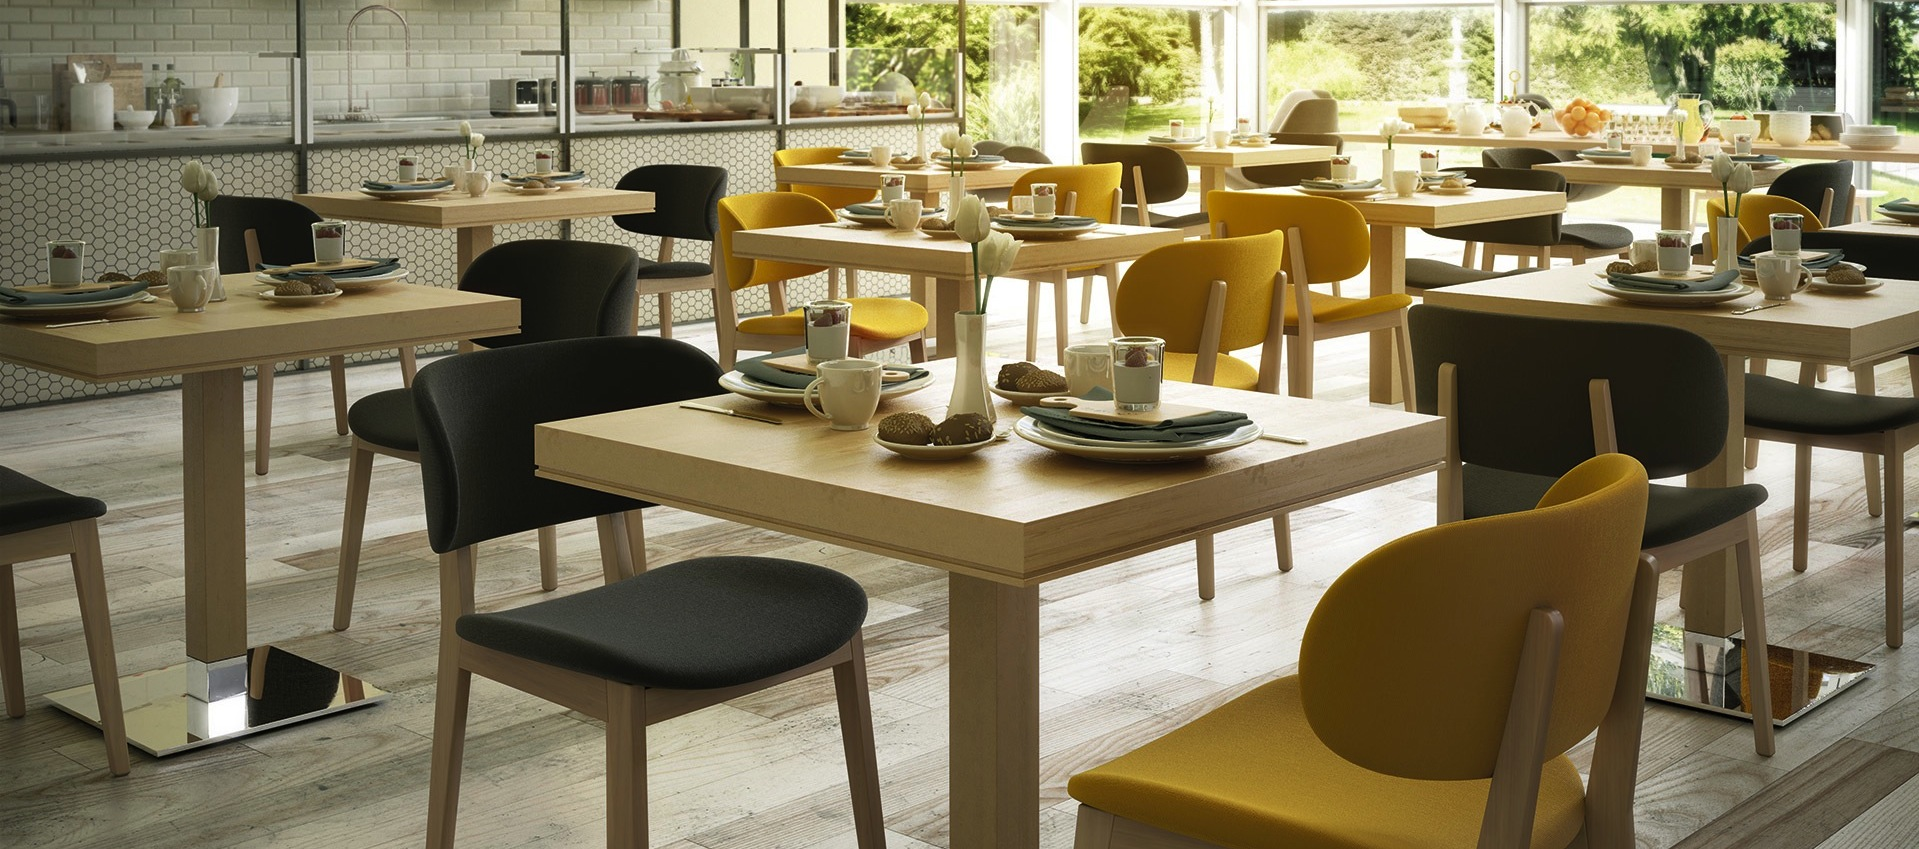 mobilier de restaurant, mobilier chr